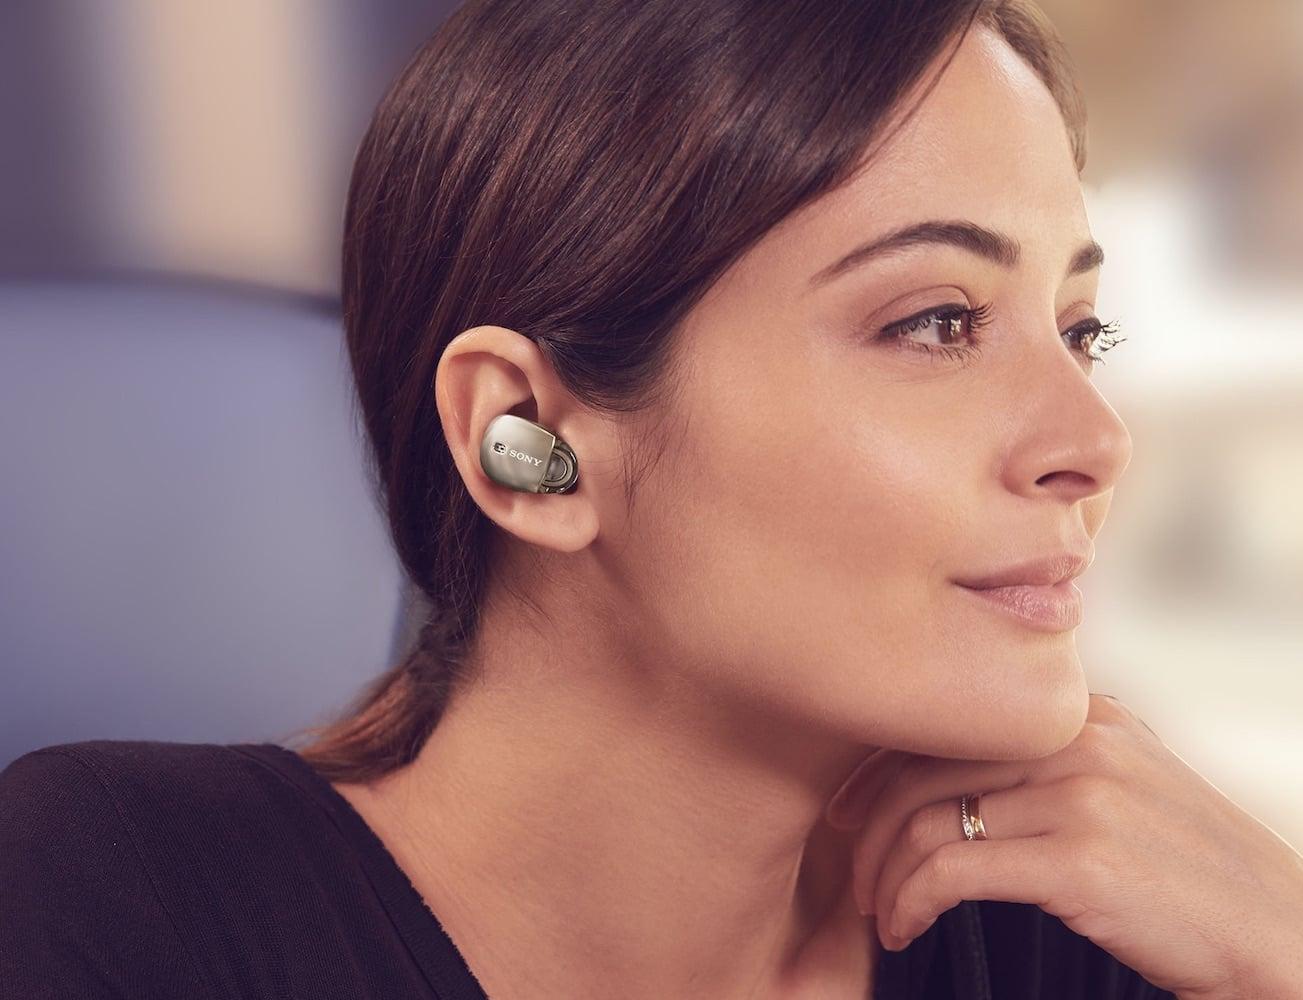 Sony 1000X Wireless Noise-Canceling Headphones